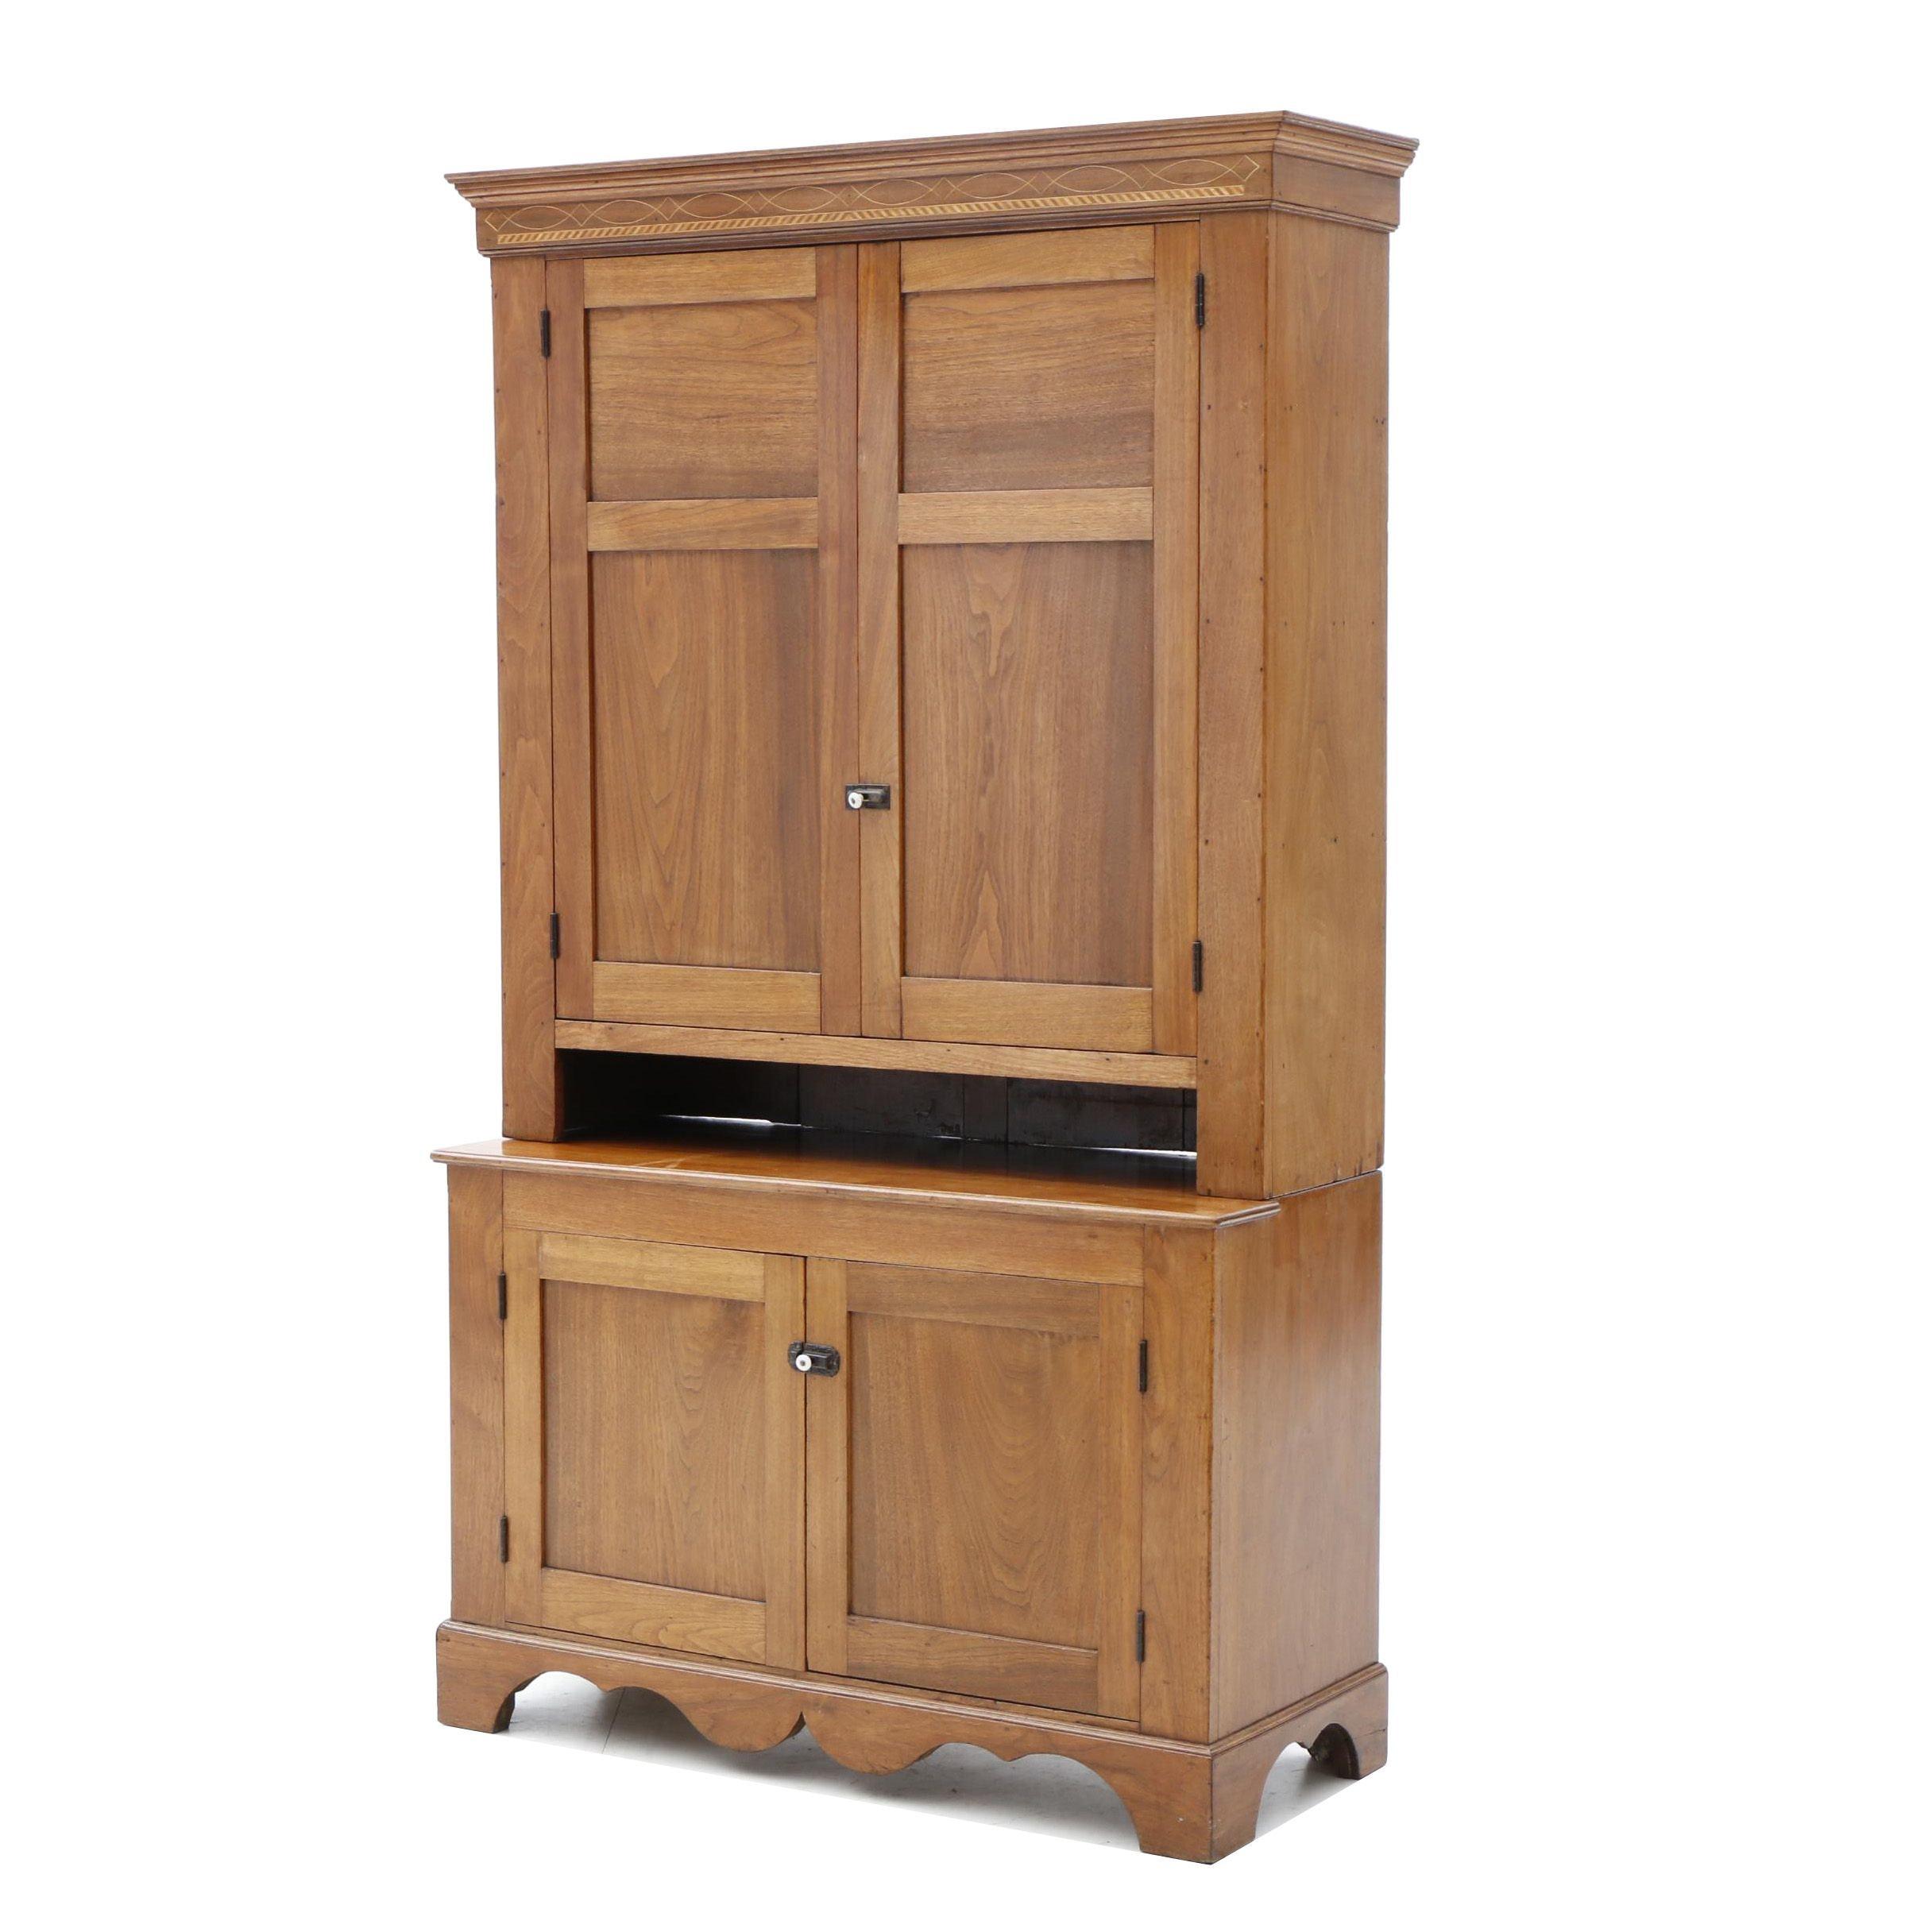 Early Kentucky or Regional Inlaid Walnut Press Cupboard, Early 19th Century